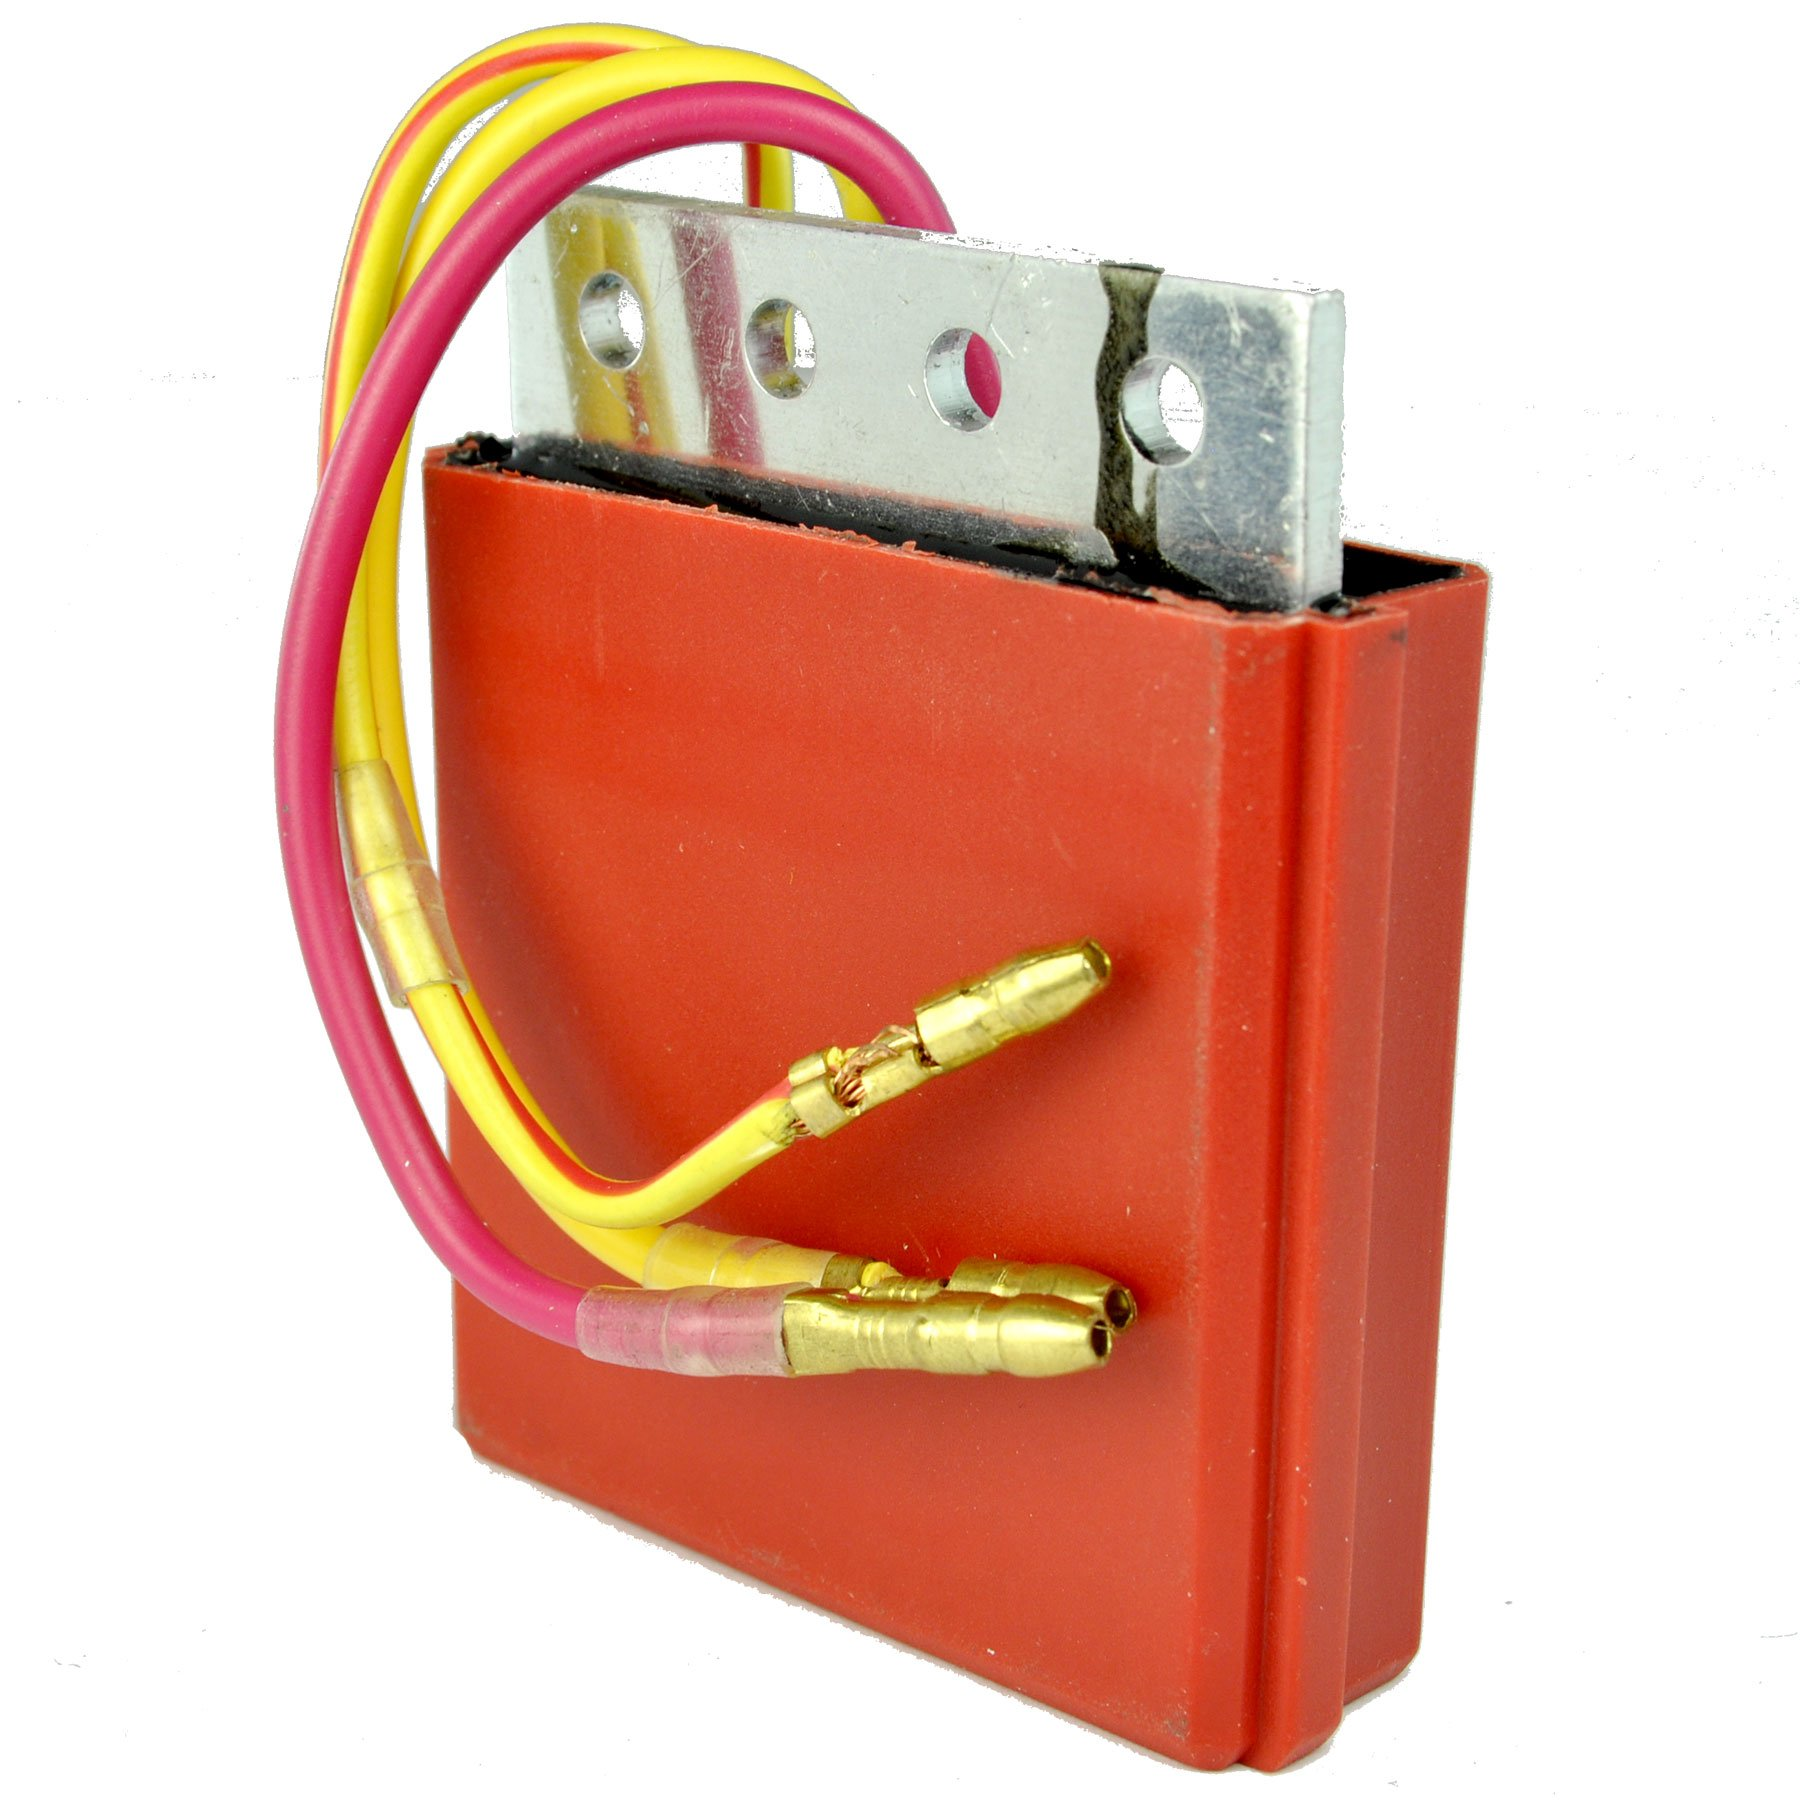 O-Ring Drive Chain /& Sprockets Kit Fits POLARIS XPLORER 250 4X4 2001 2002